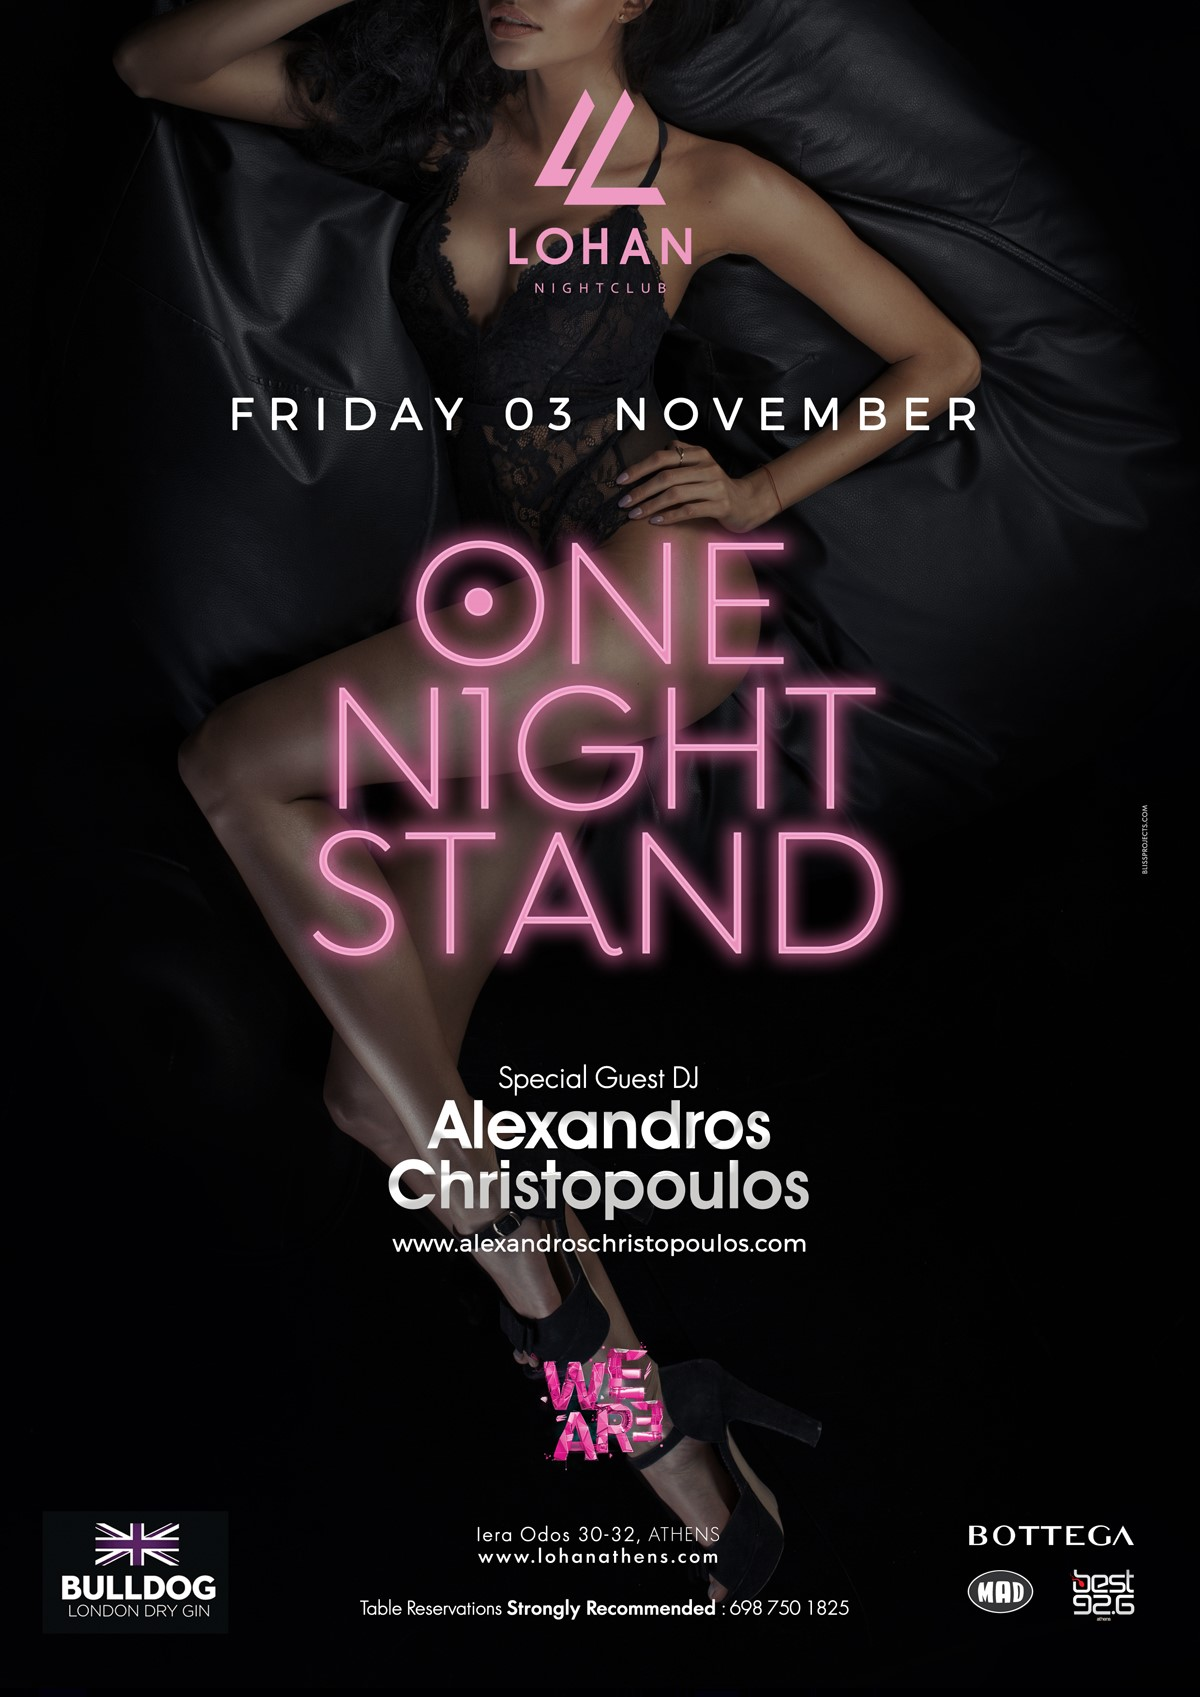 ONE NIGHT STAND |LOHAN